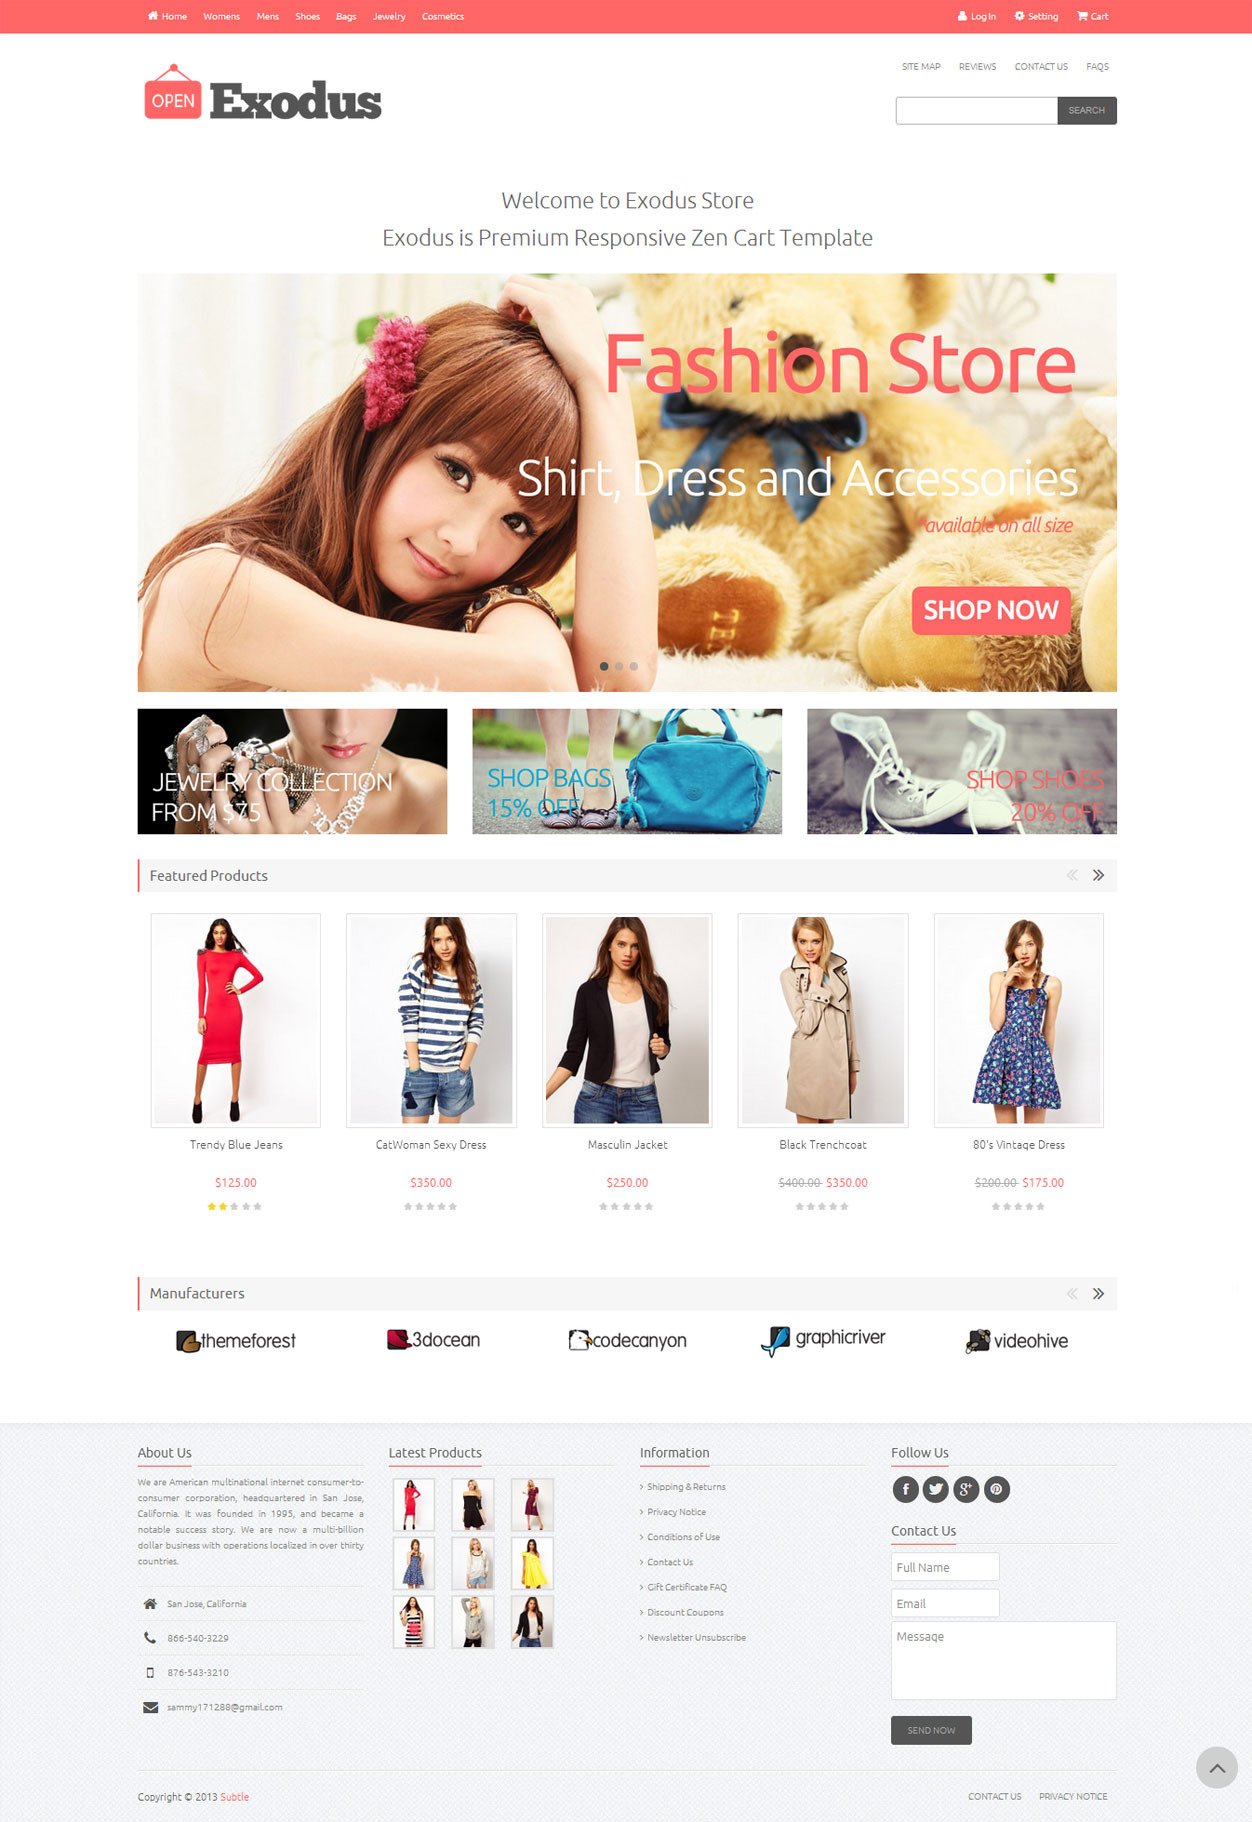 http://2.s3.envato.com/files/53226415/02_Homepage.jpg